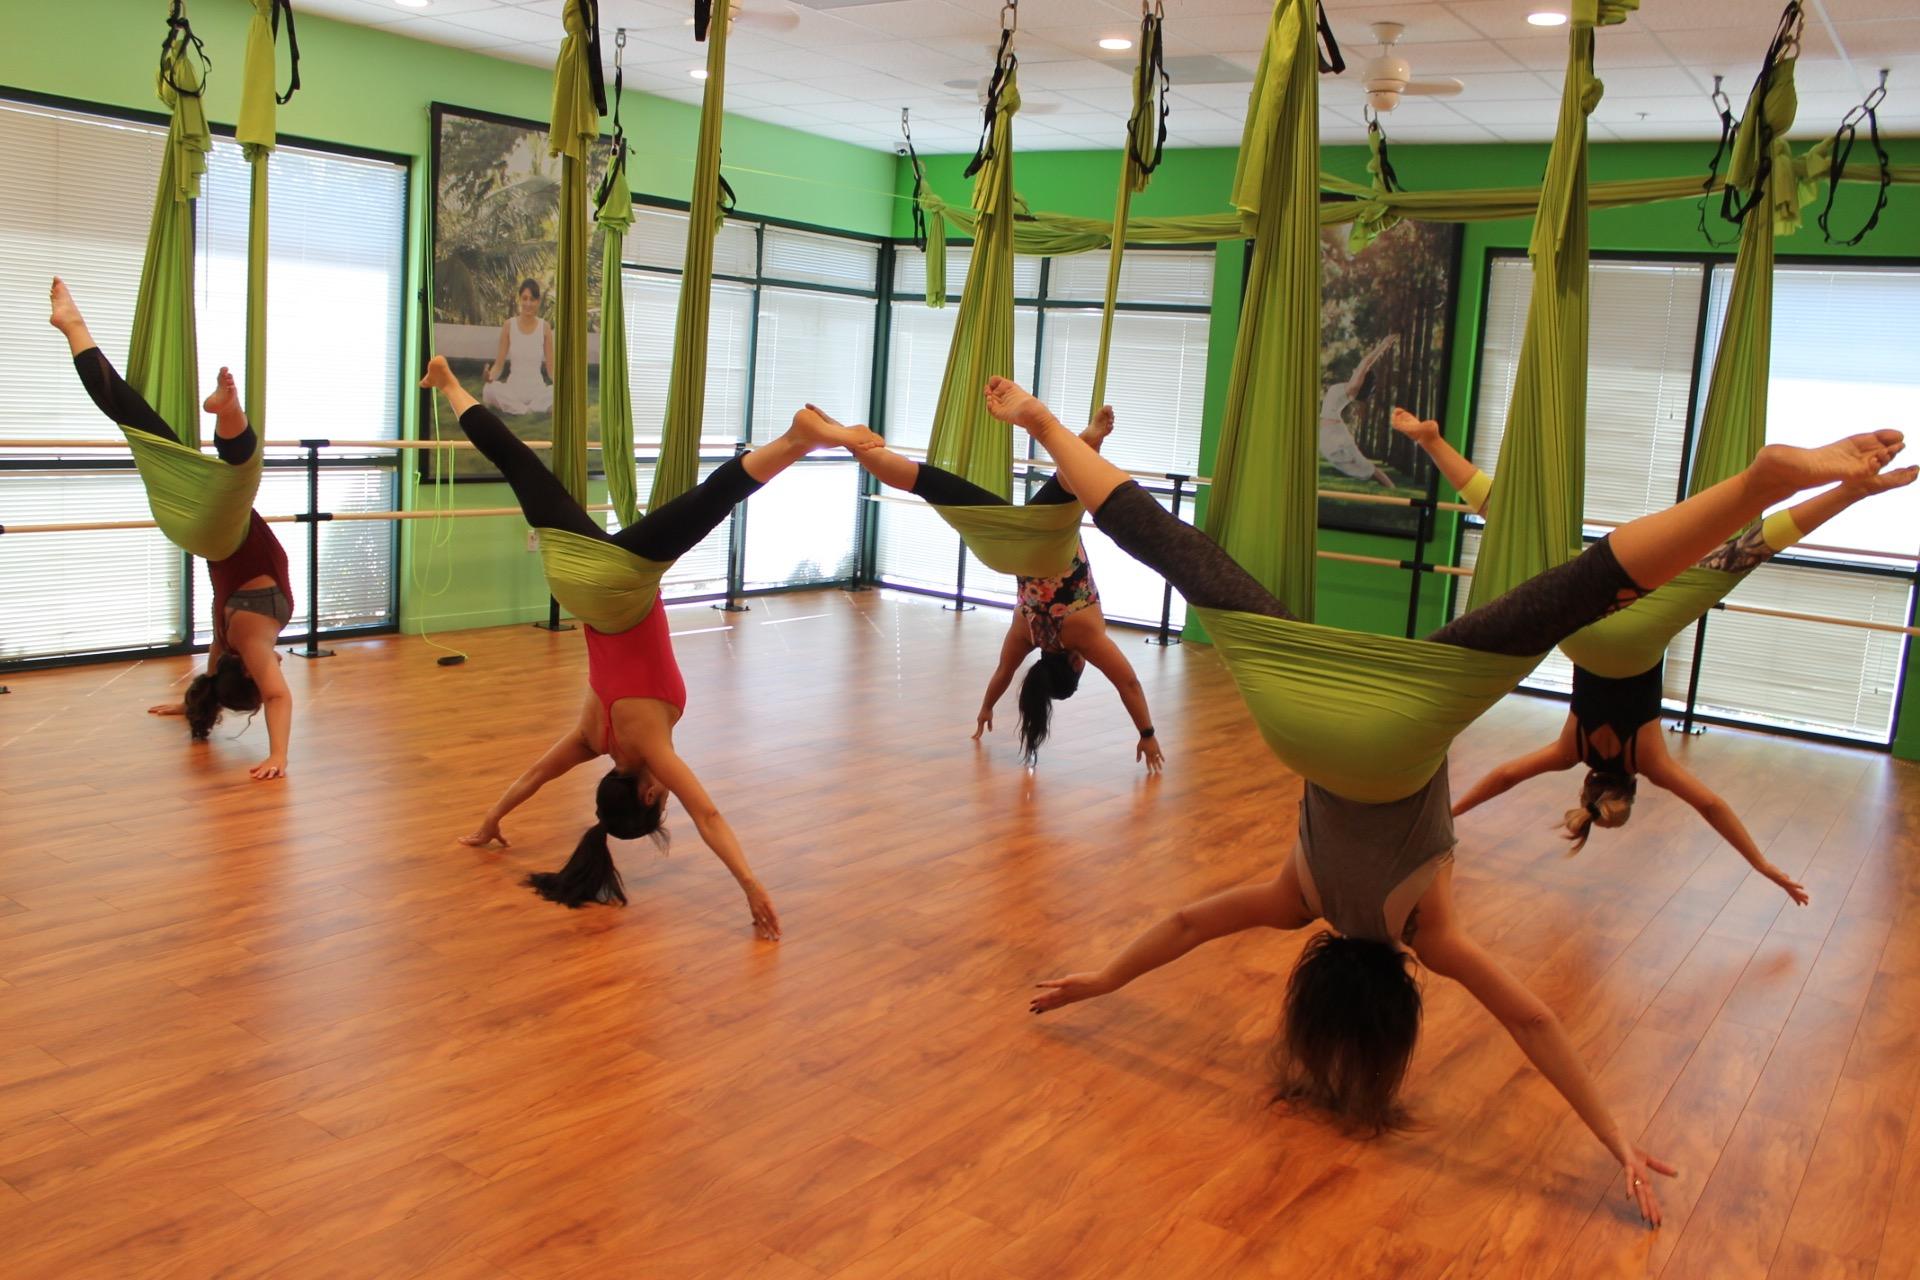 Aerial Yoga Image 2